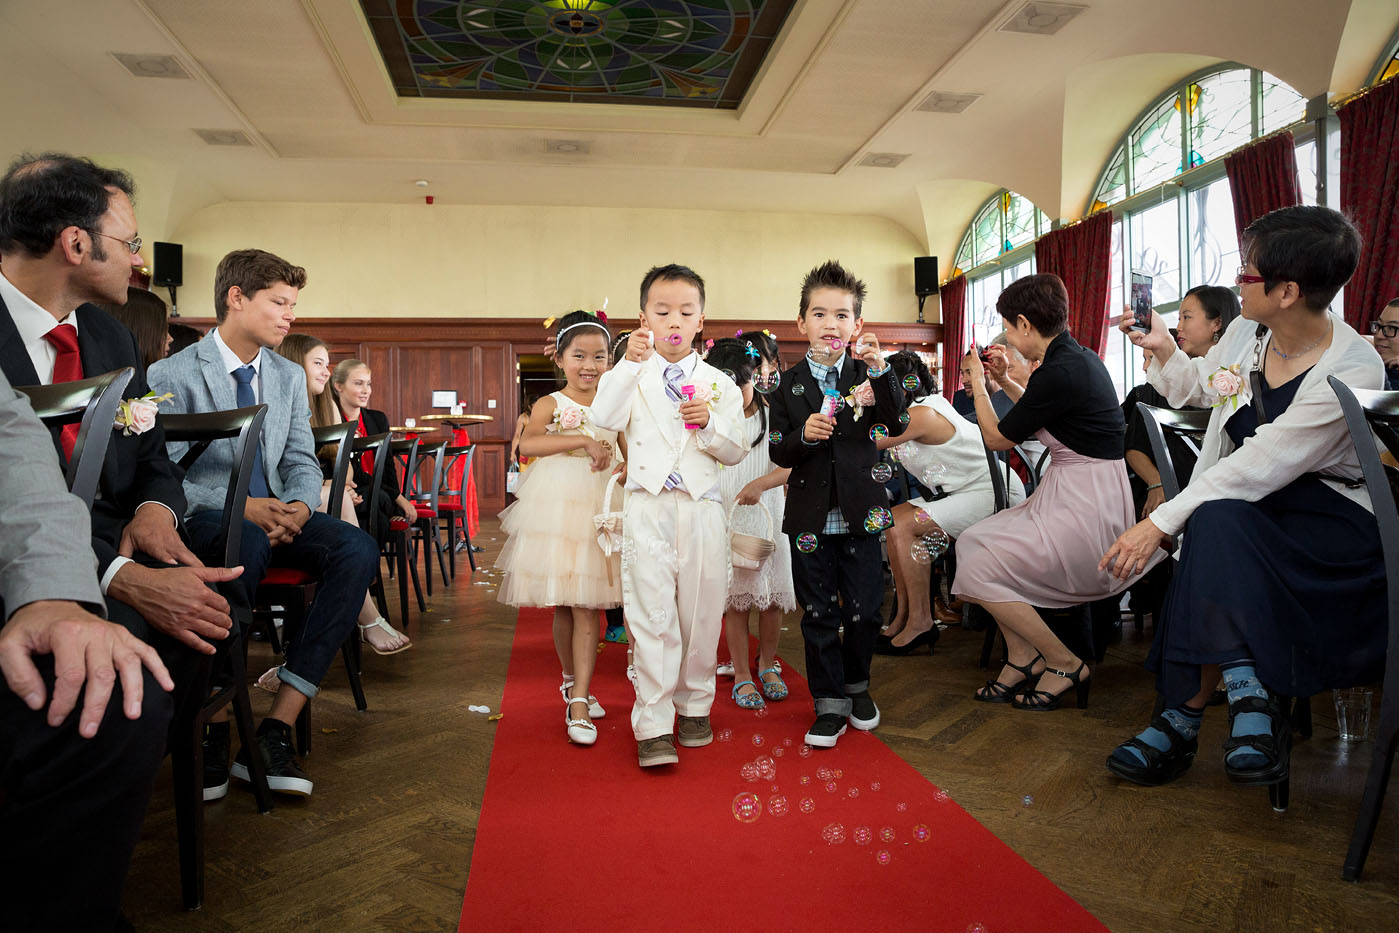 bruiloft-wedding-trouwen-fotograaf-chinees-bobhersbach-rotterdam-kinderen